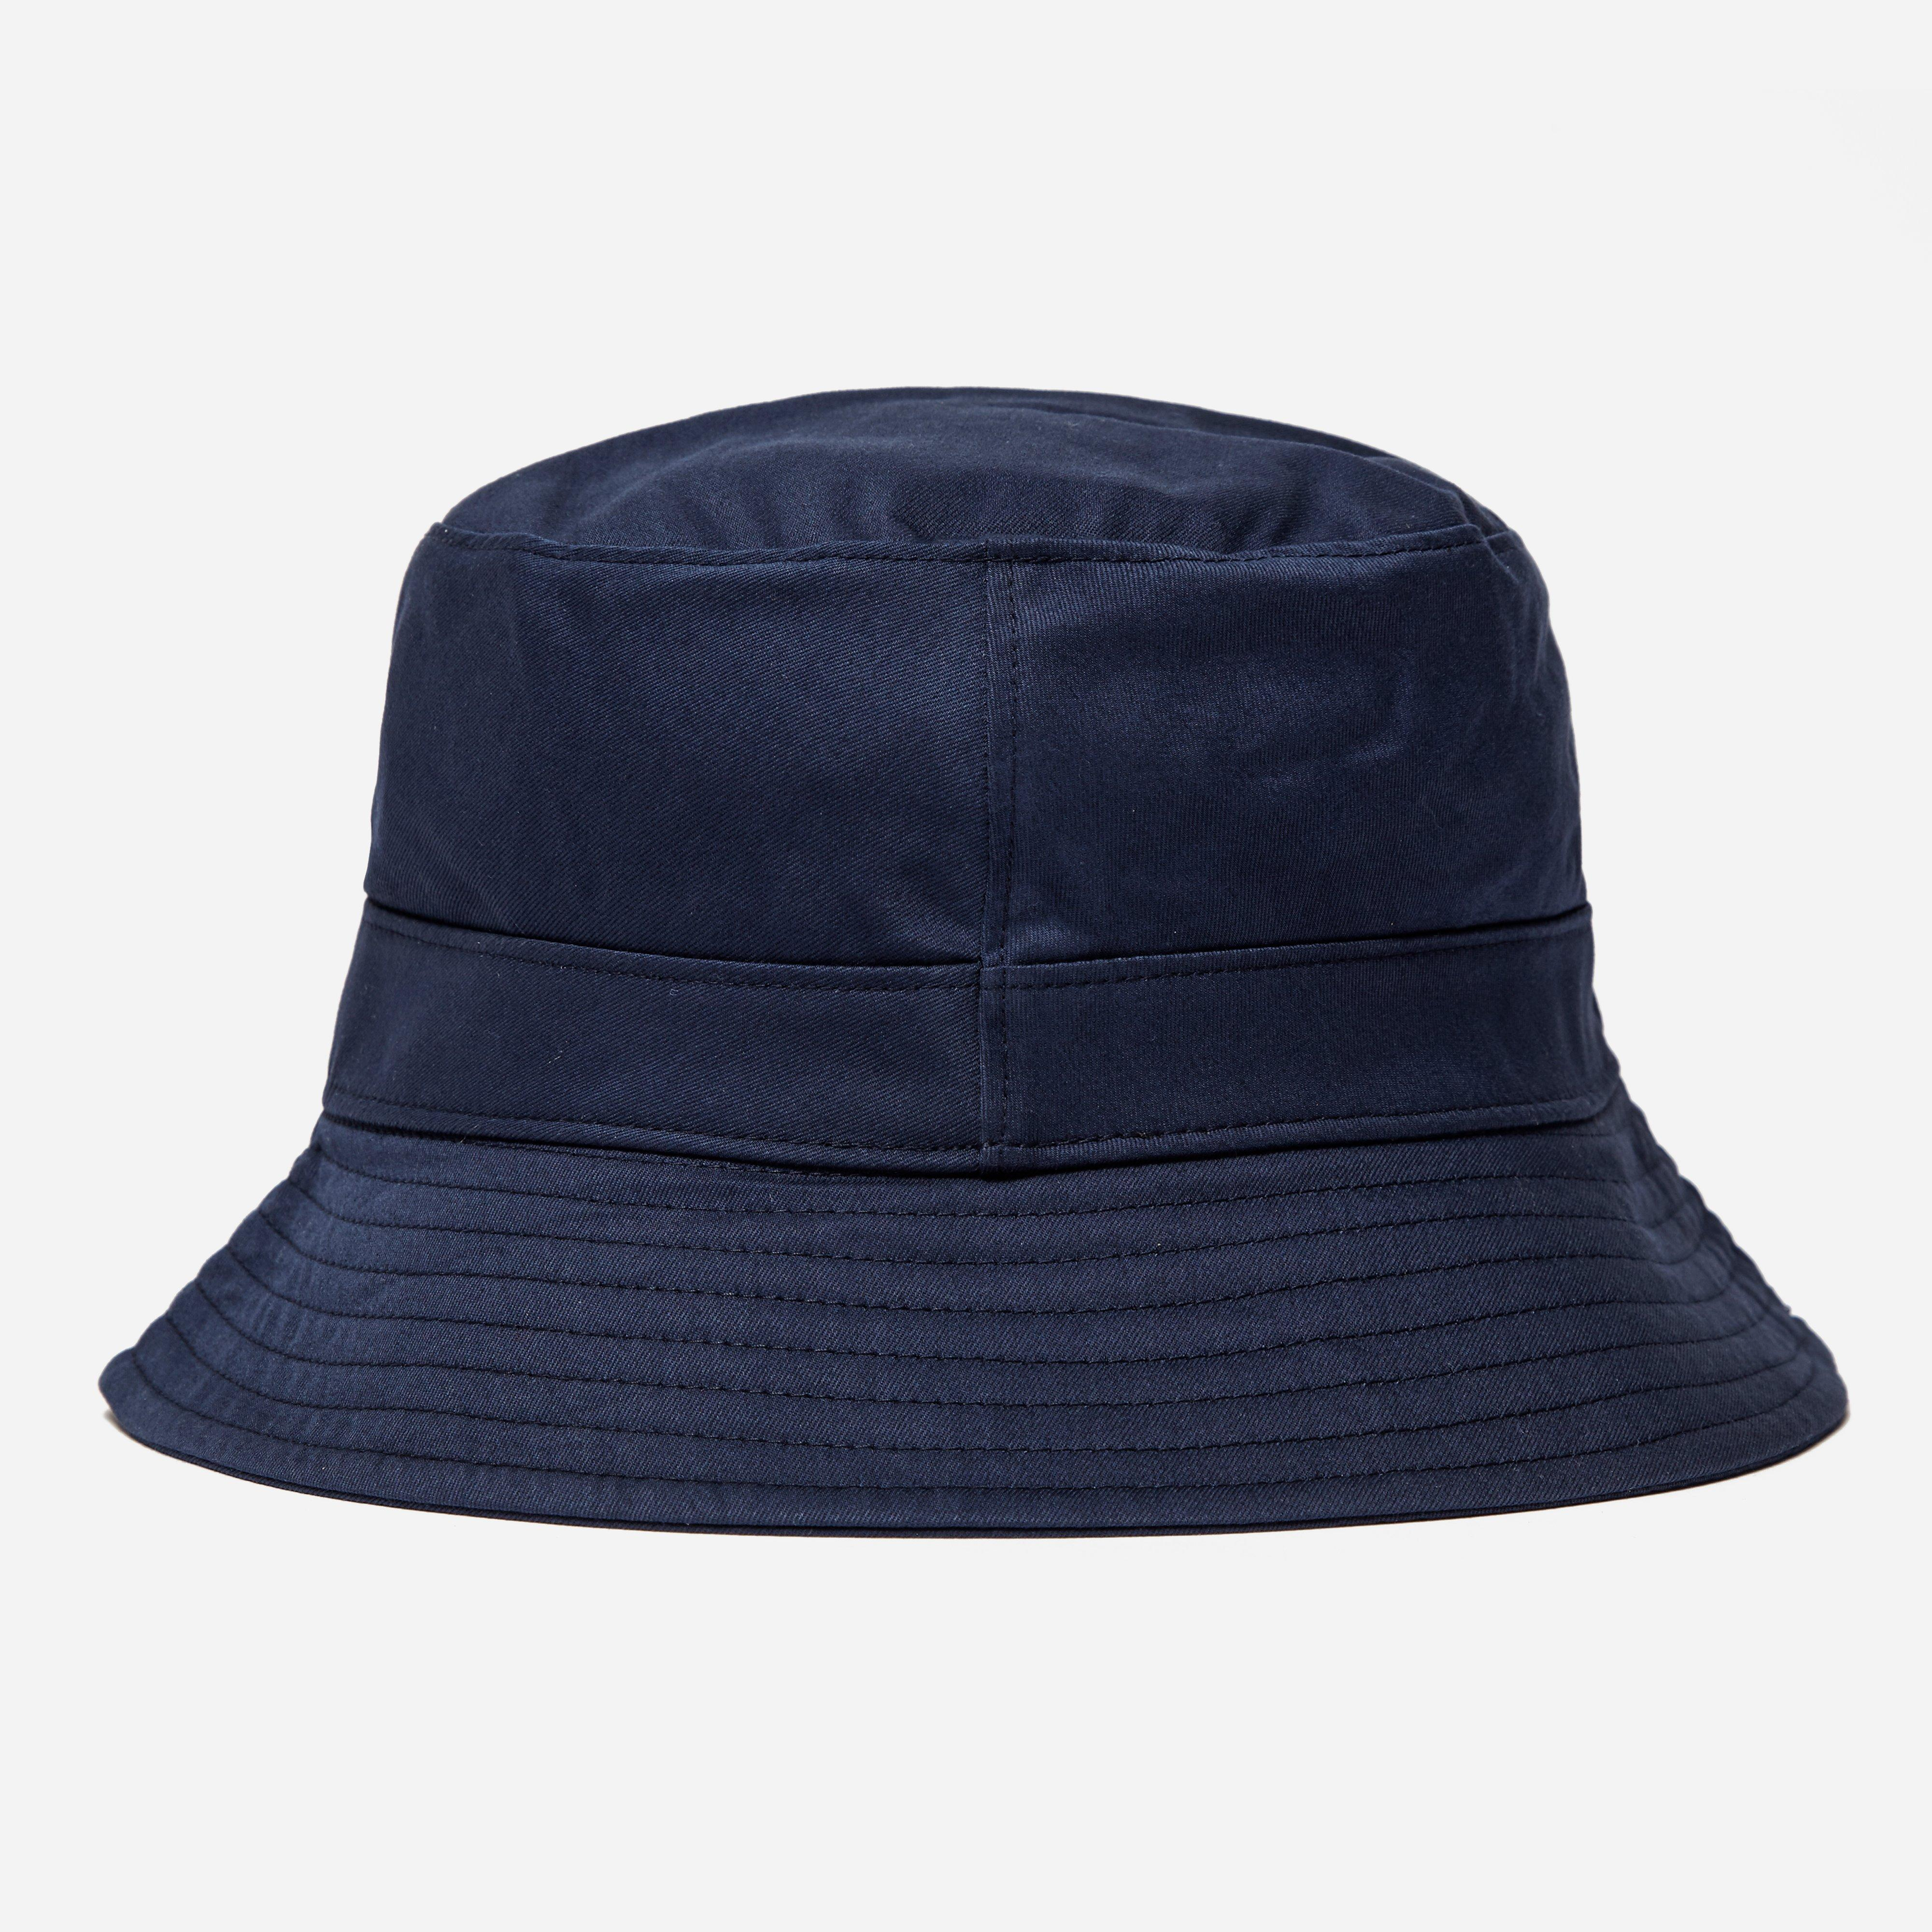 lyst polo ralph lauren bucket hat in blue for men